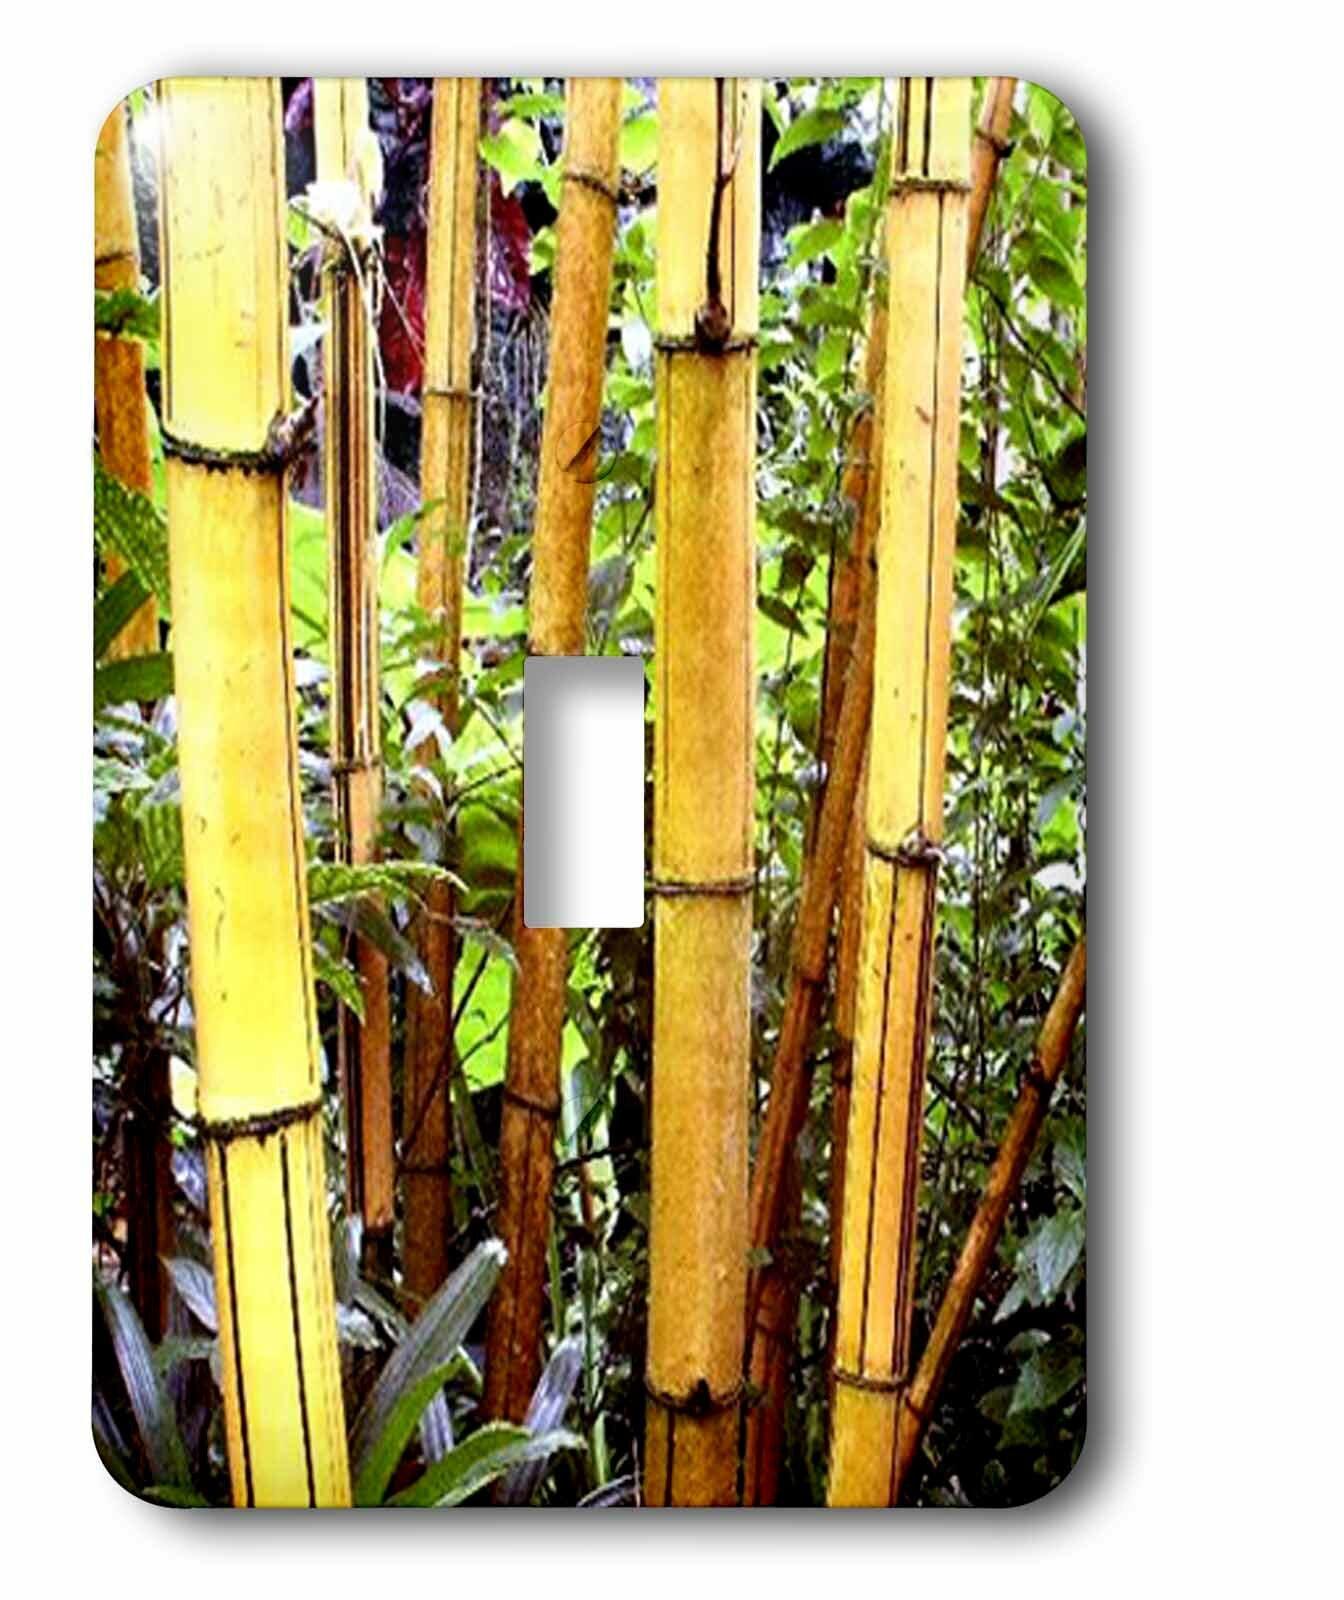 3drose Bamboo 1 Gang Toggle Light Switch Wall Plate Wayfair